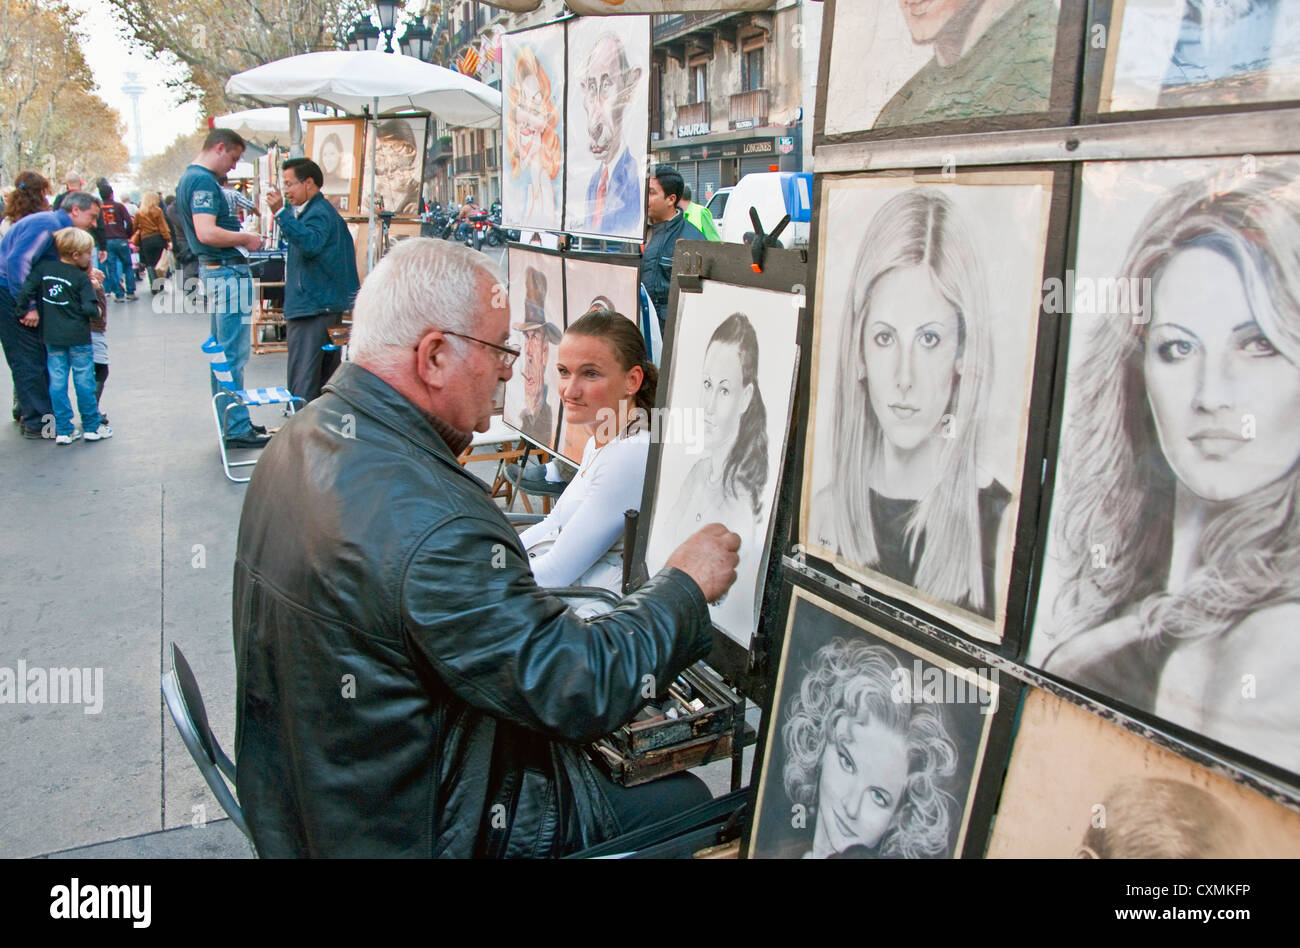 Artist on Las Ramblas in Barcelona sketching portrait - Stock Image